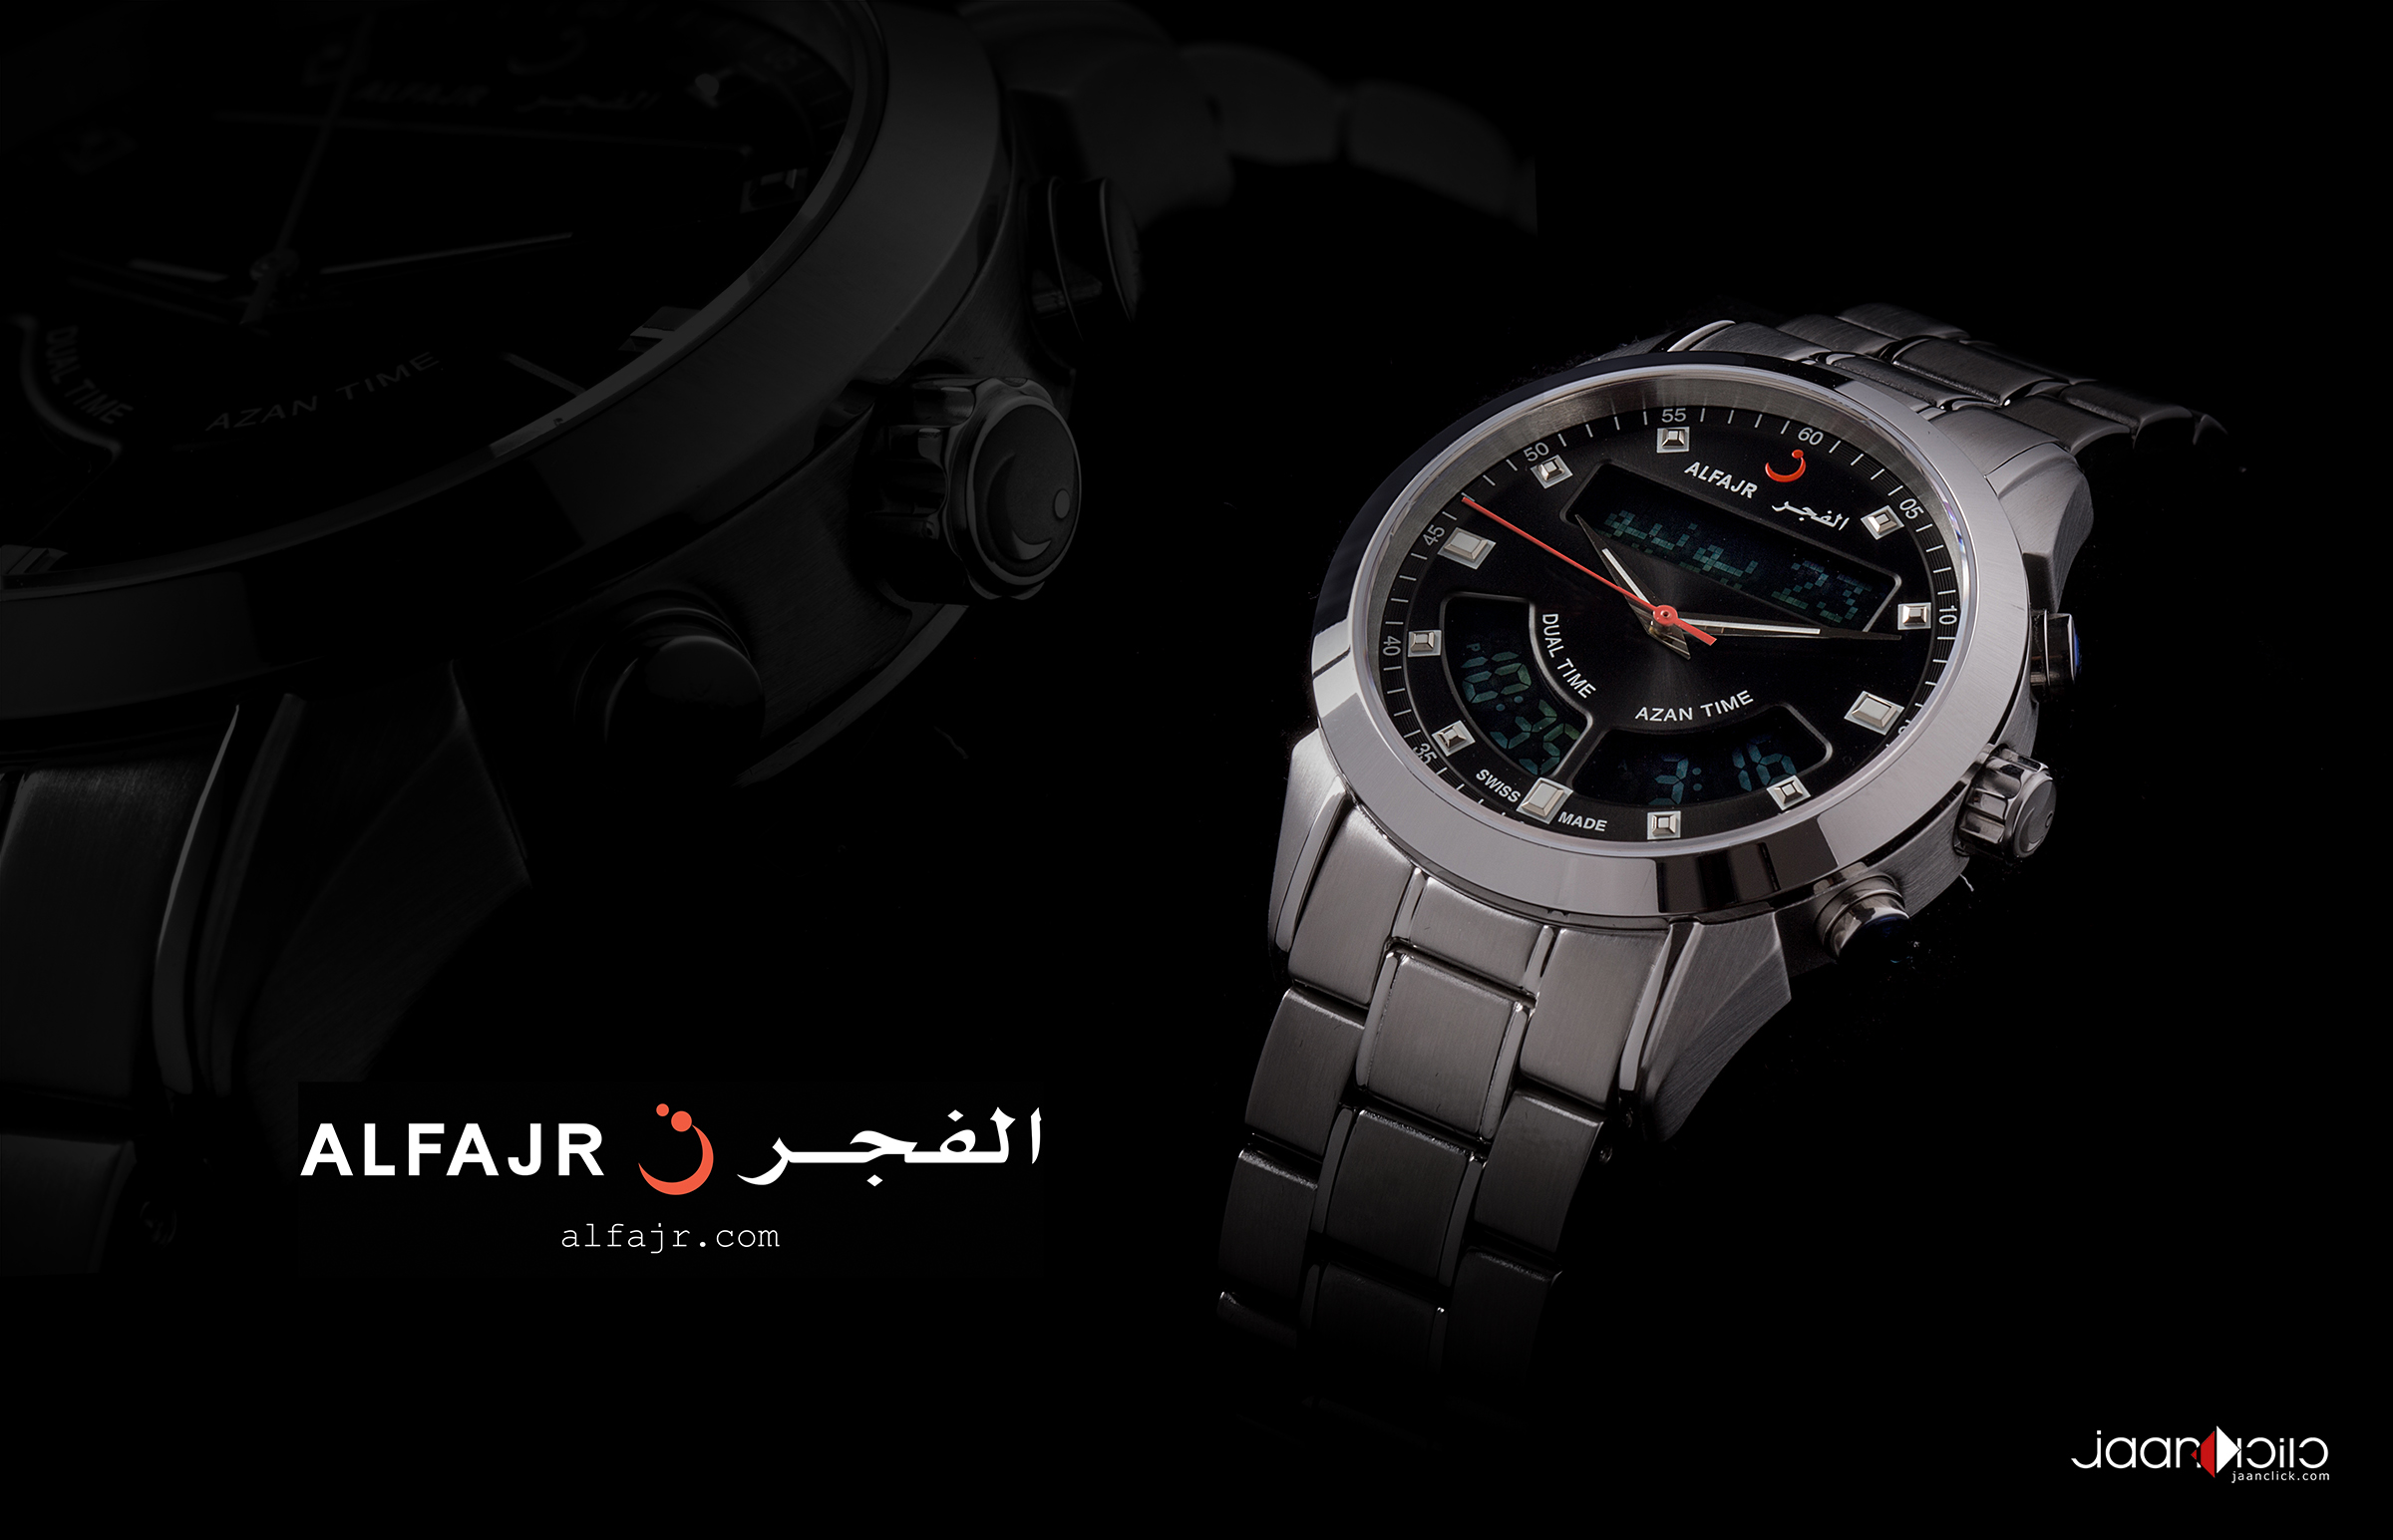 alfajr watch.jpg